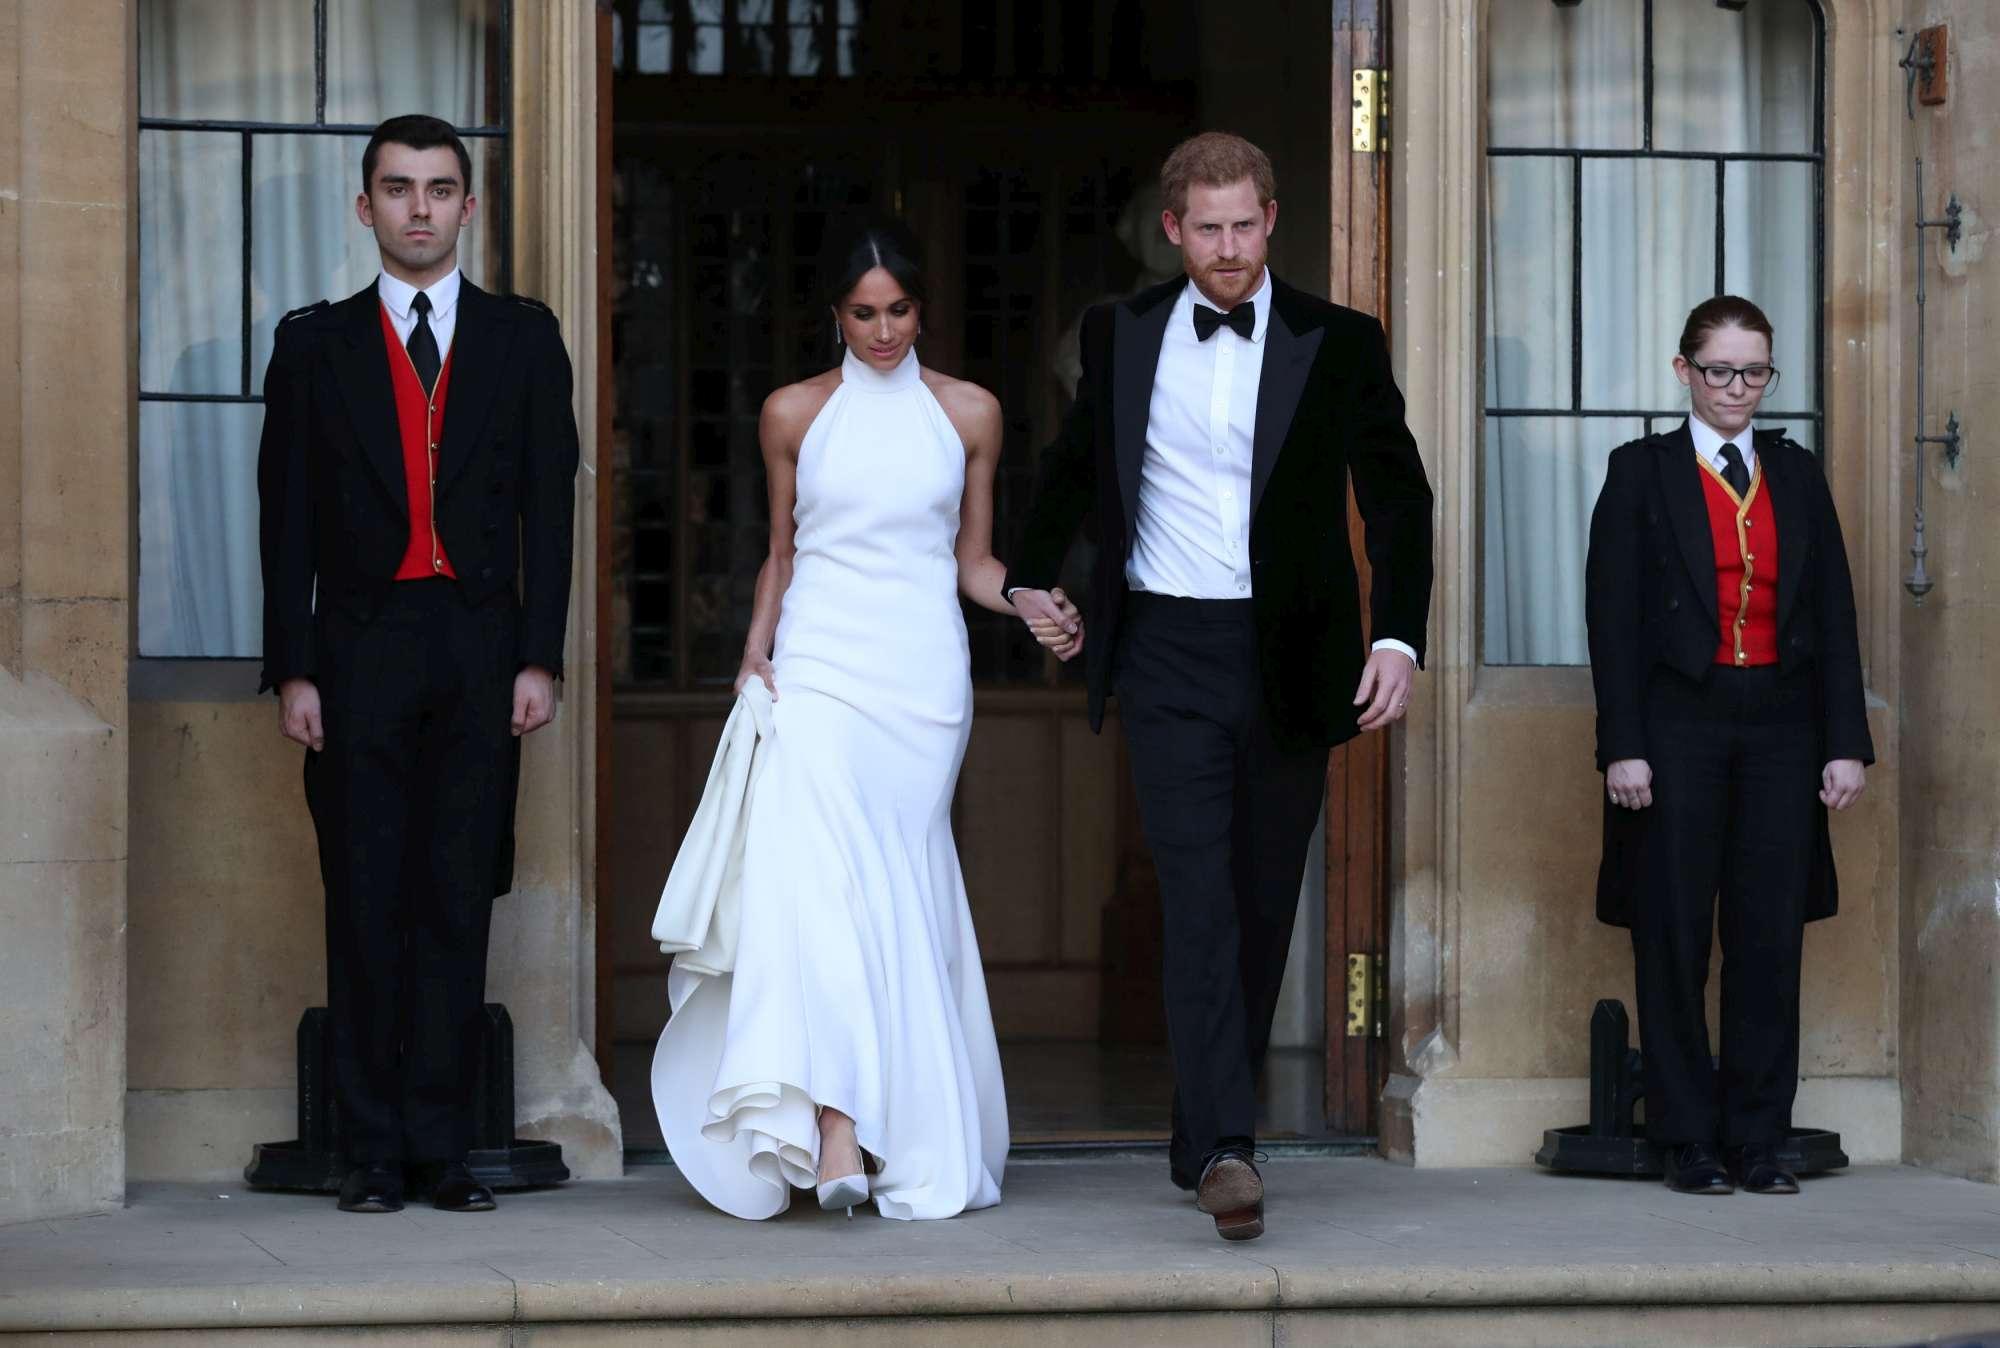 Royal wedding, gli sposi si recano al ricevimento reale